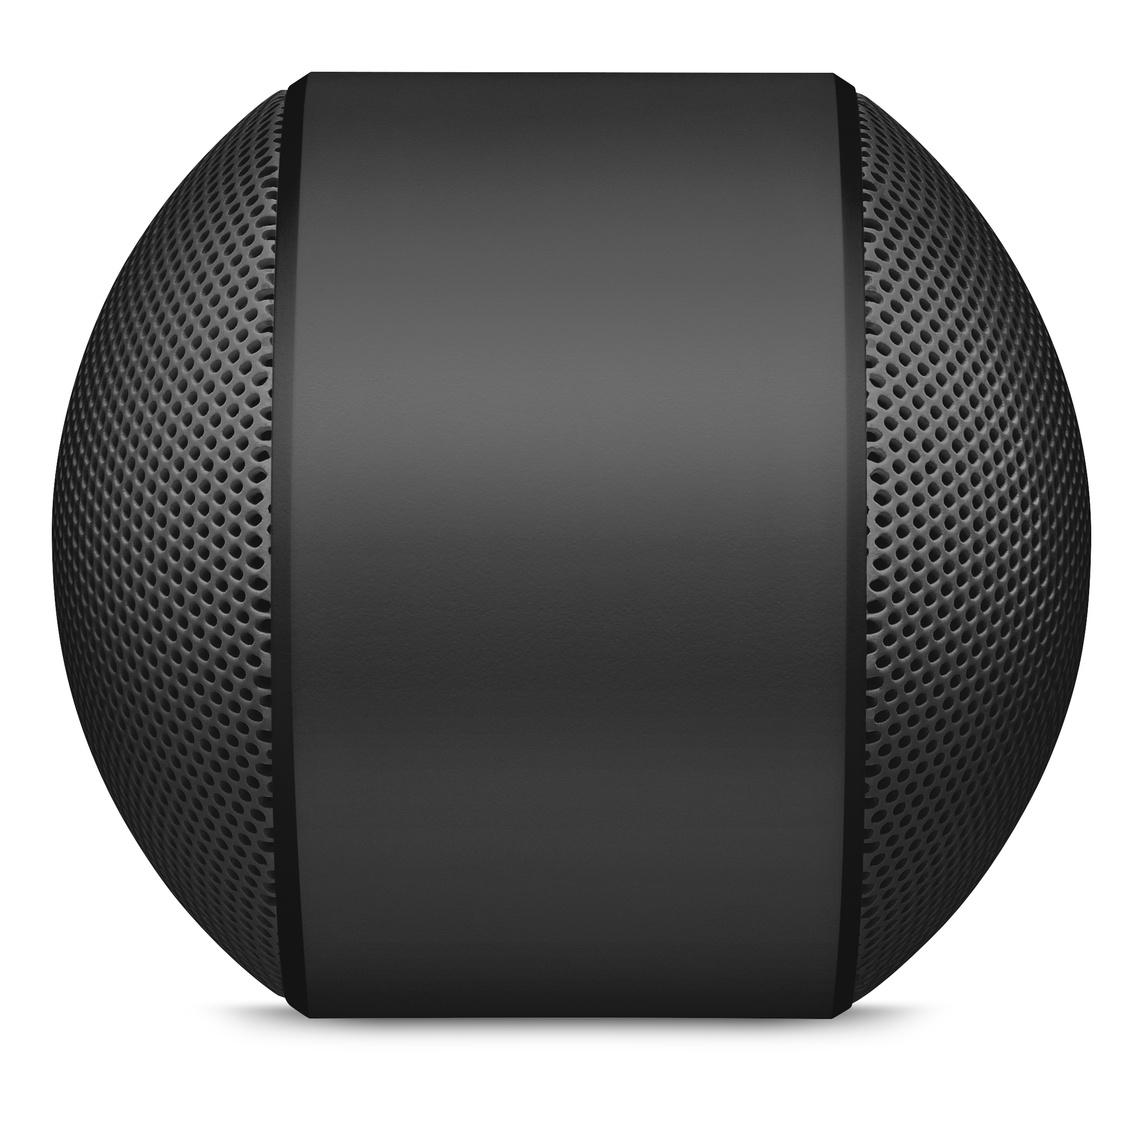 9f2c40475a1536 Przenośny głośnik Beats Pill+ – czarny - Apple (PL)